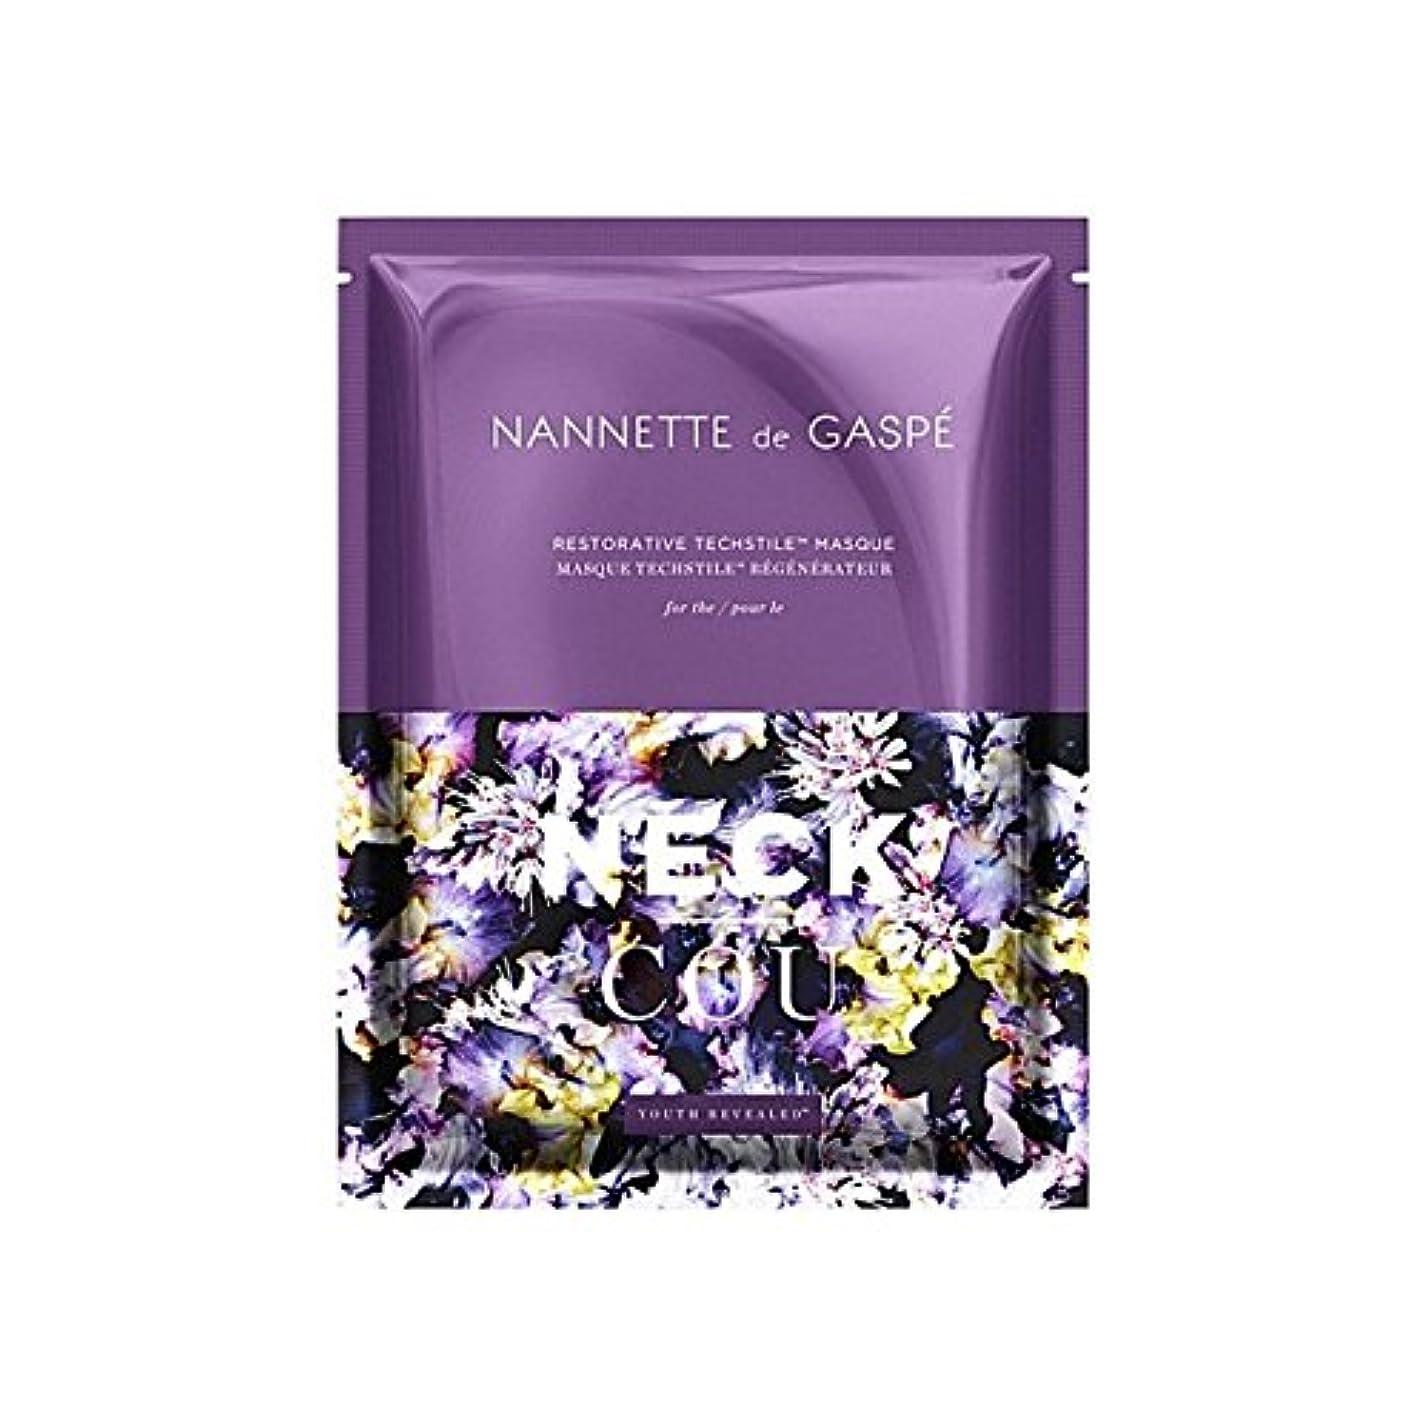 Nannette De Gaspe Restorative Techstile Neck Masque - デガスペ修復首の仮面劇 [並行輸入品]